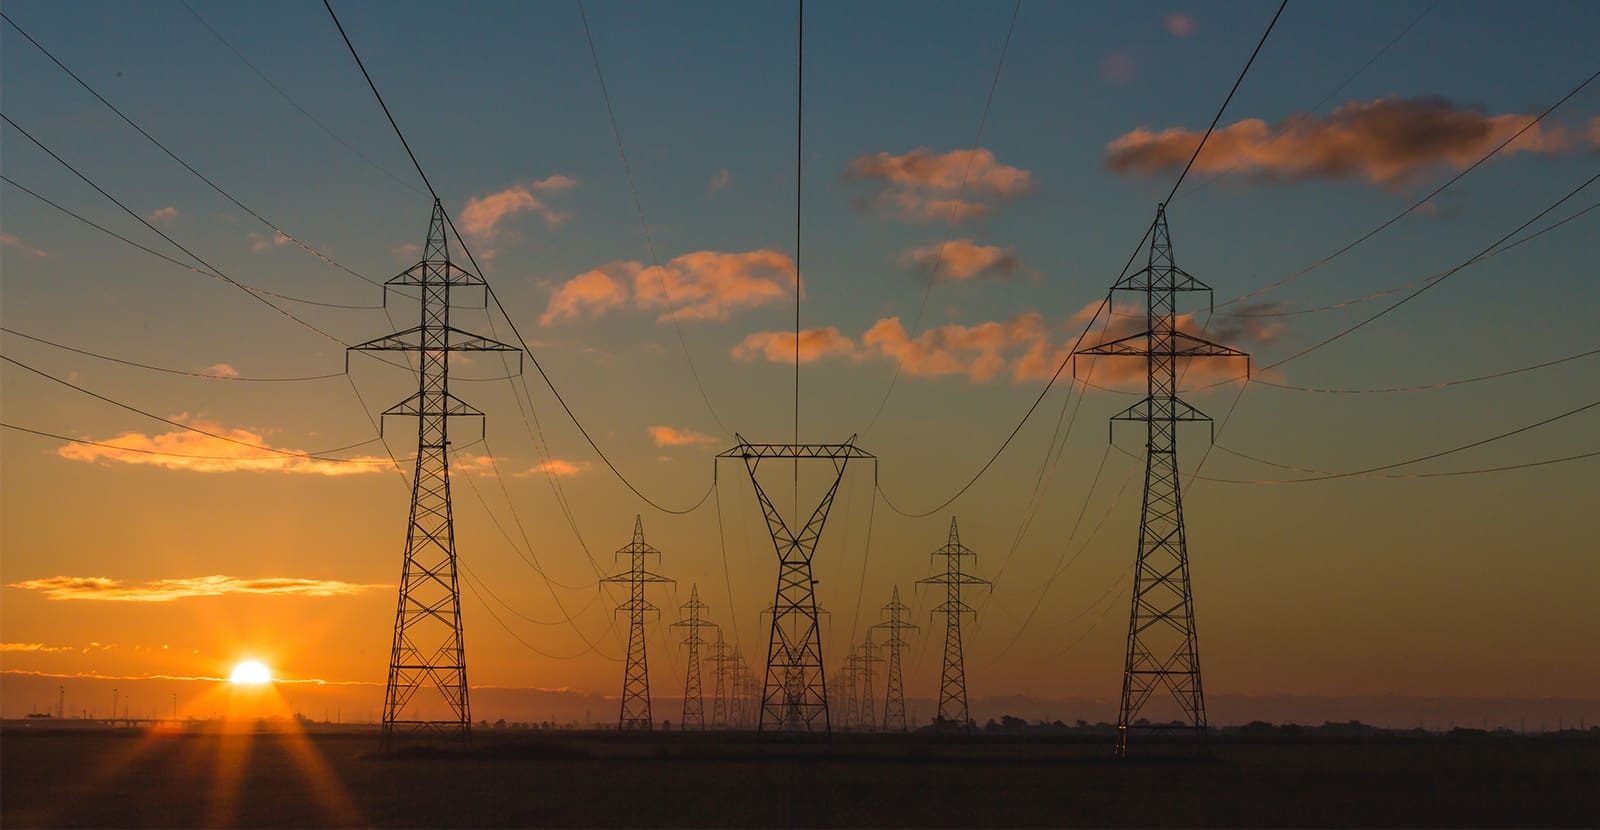 national grid service design by engine